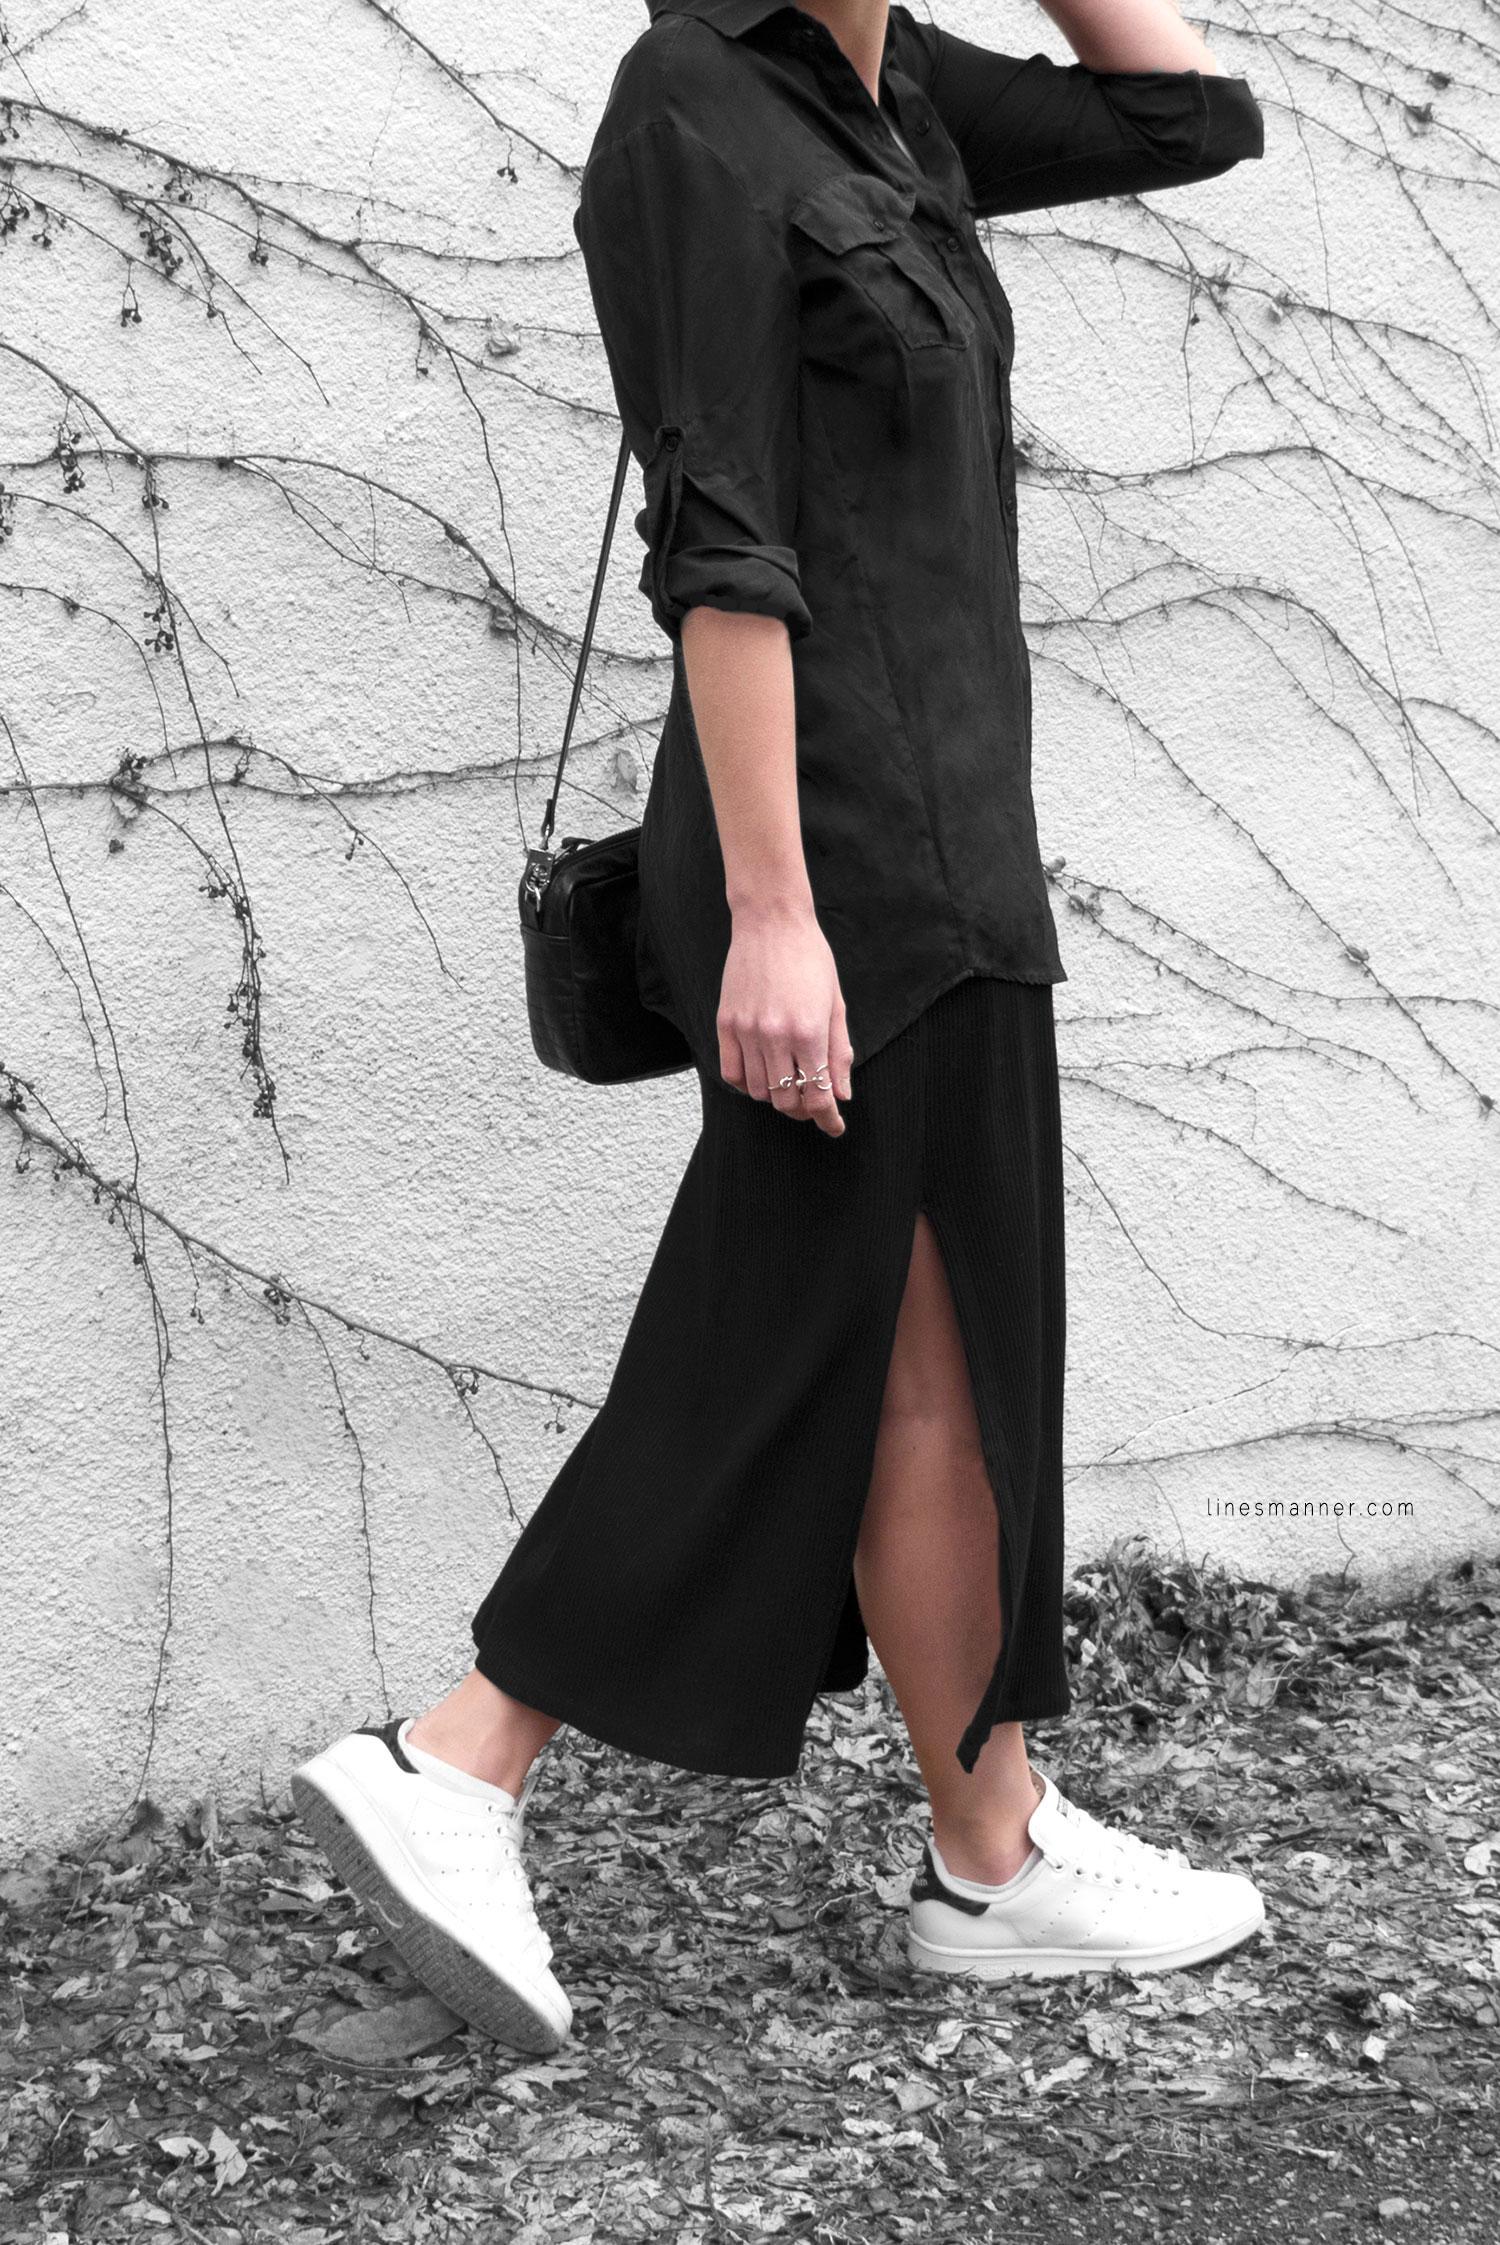 All_black_everything-monochrome-essentials-oversize-fit-textures-minimal-details-basics-staples-layering-feminine-masculine-4